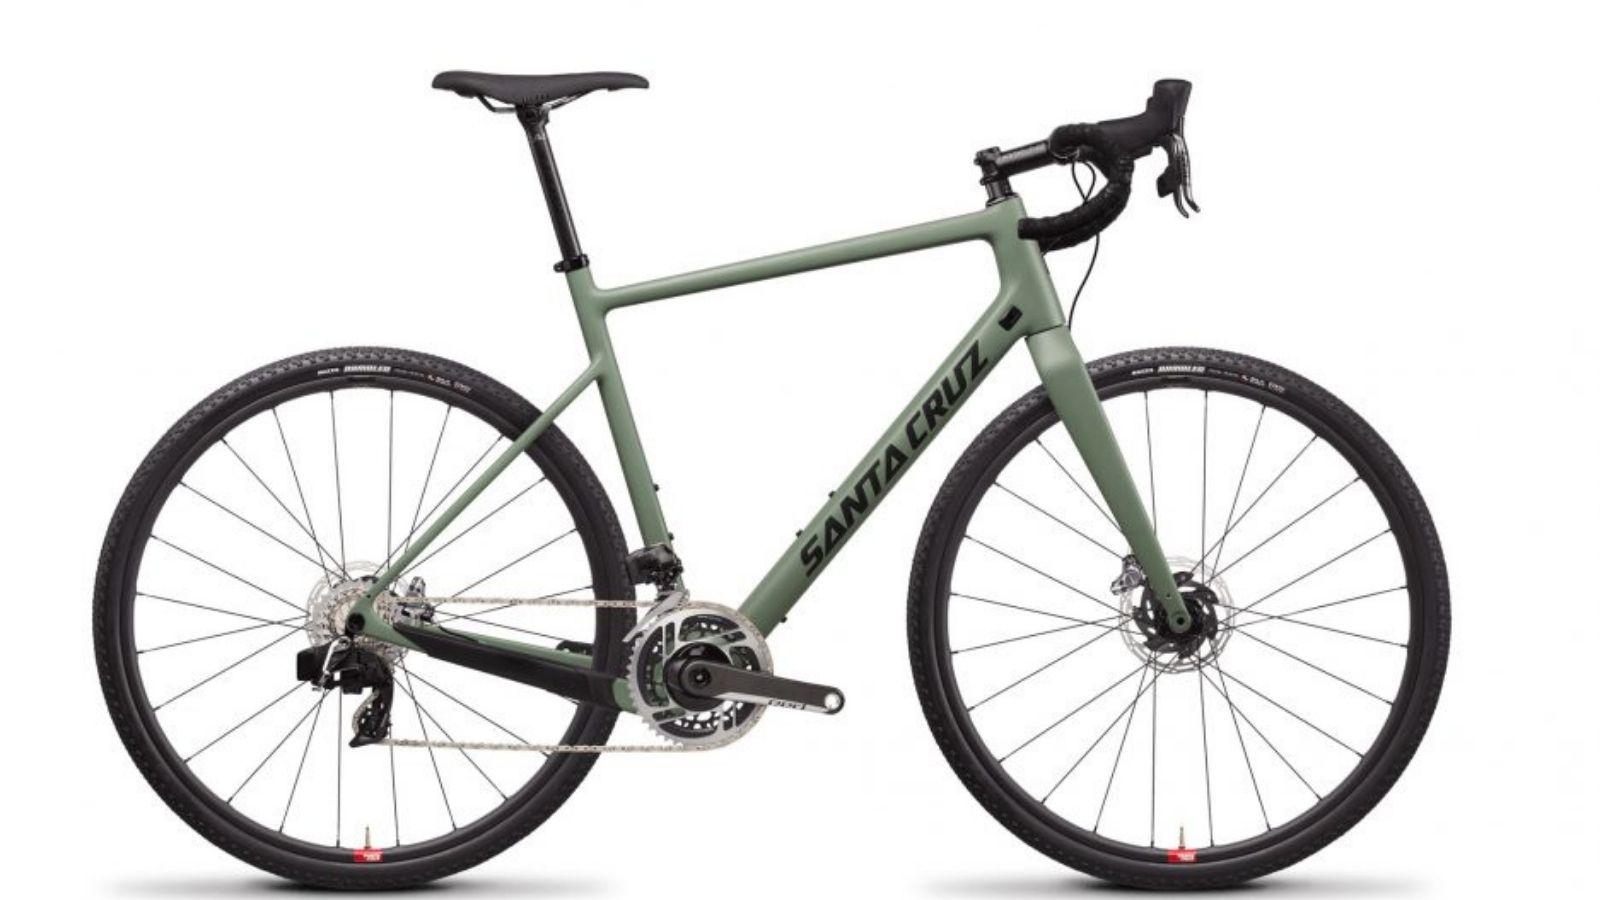 La bici da cicloturismo Santa Cruz Stigmata